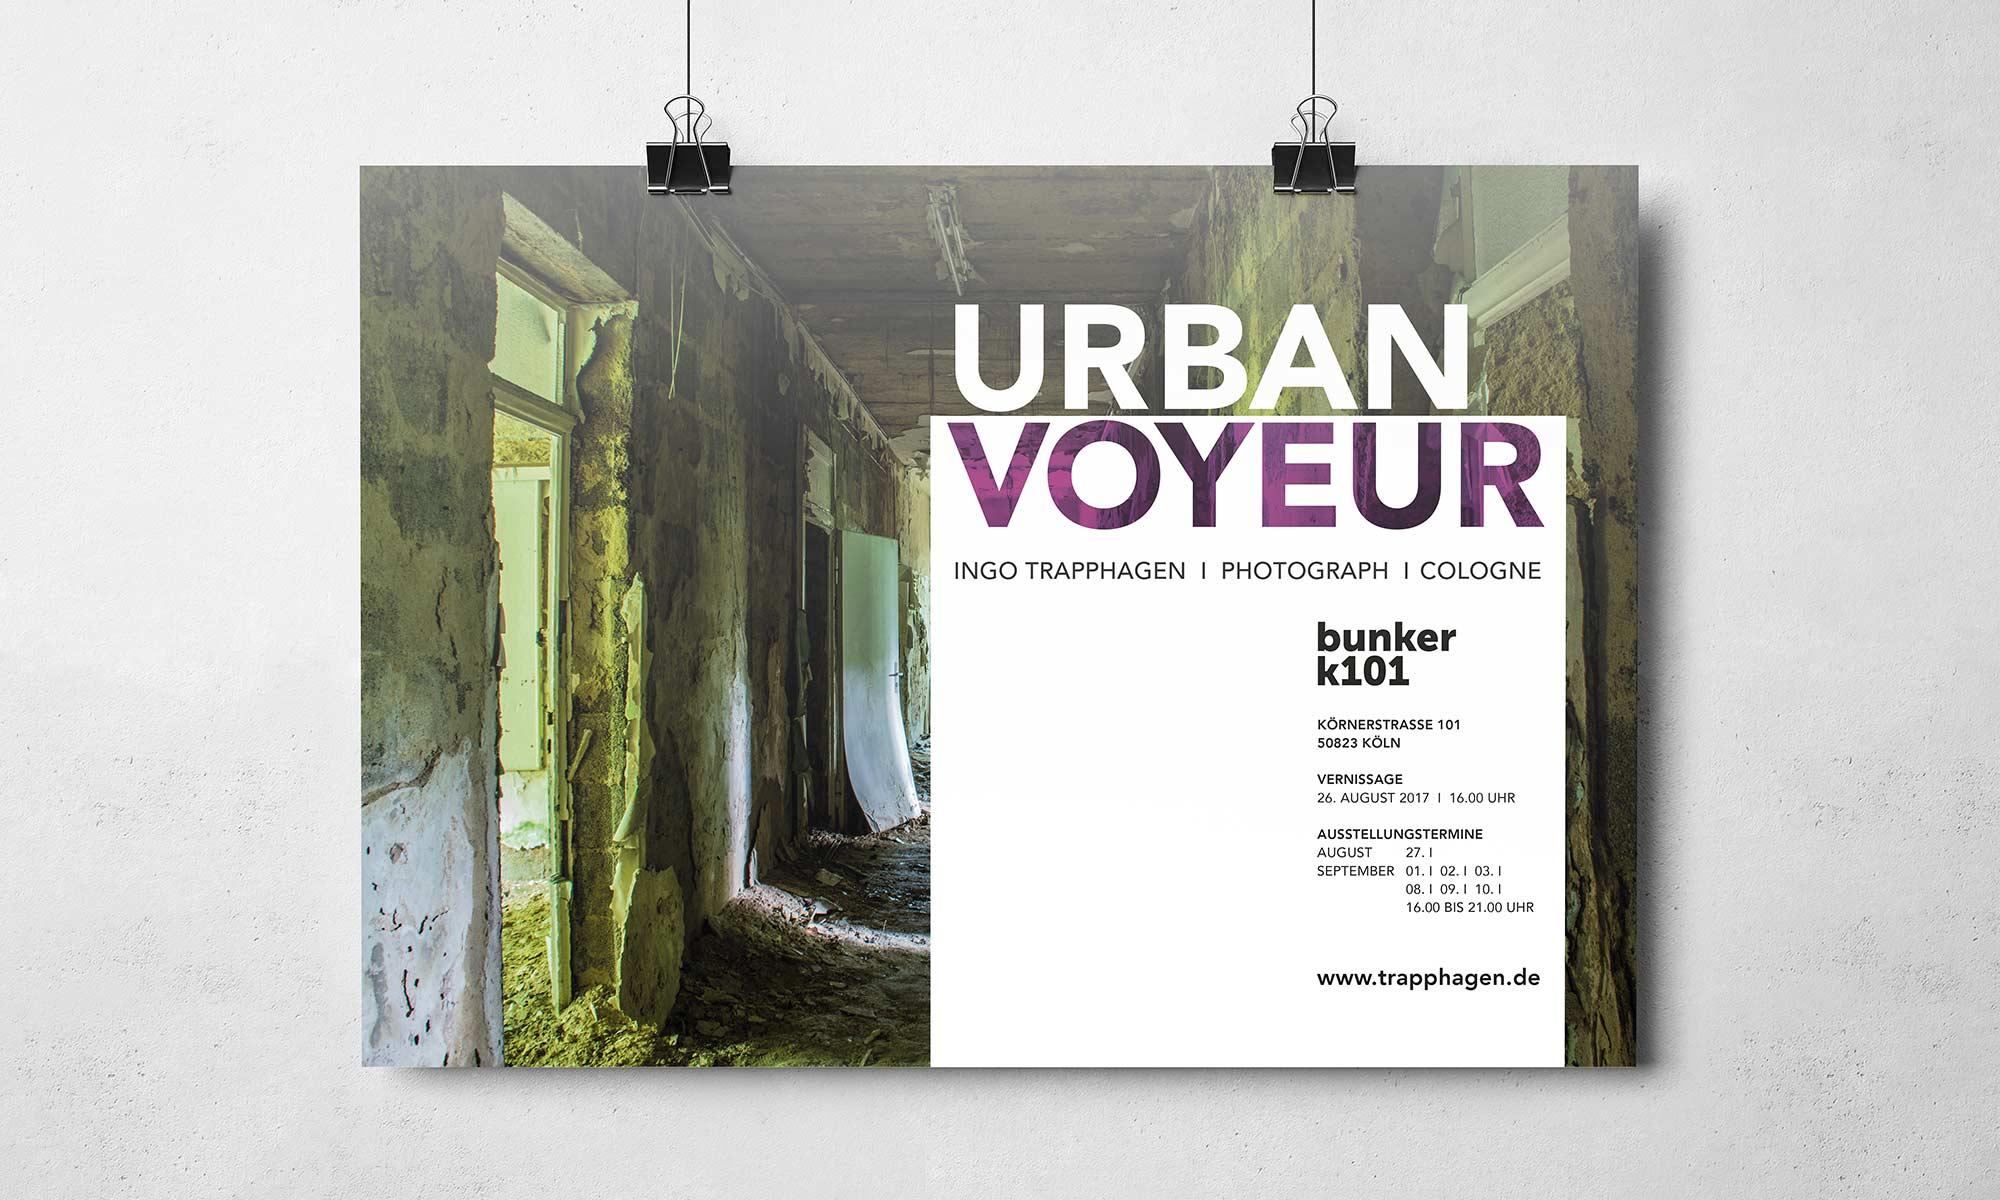 corporate-design-photograph-plakat bunker K101